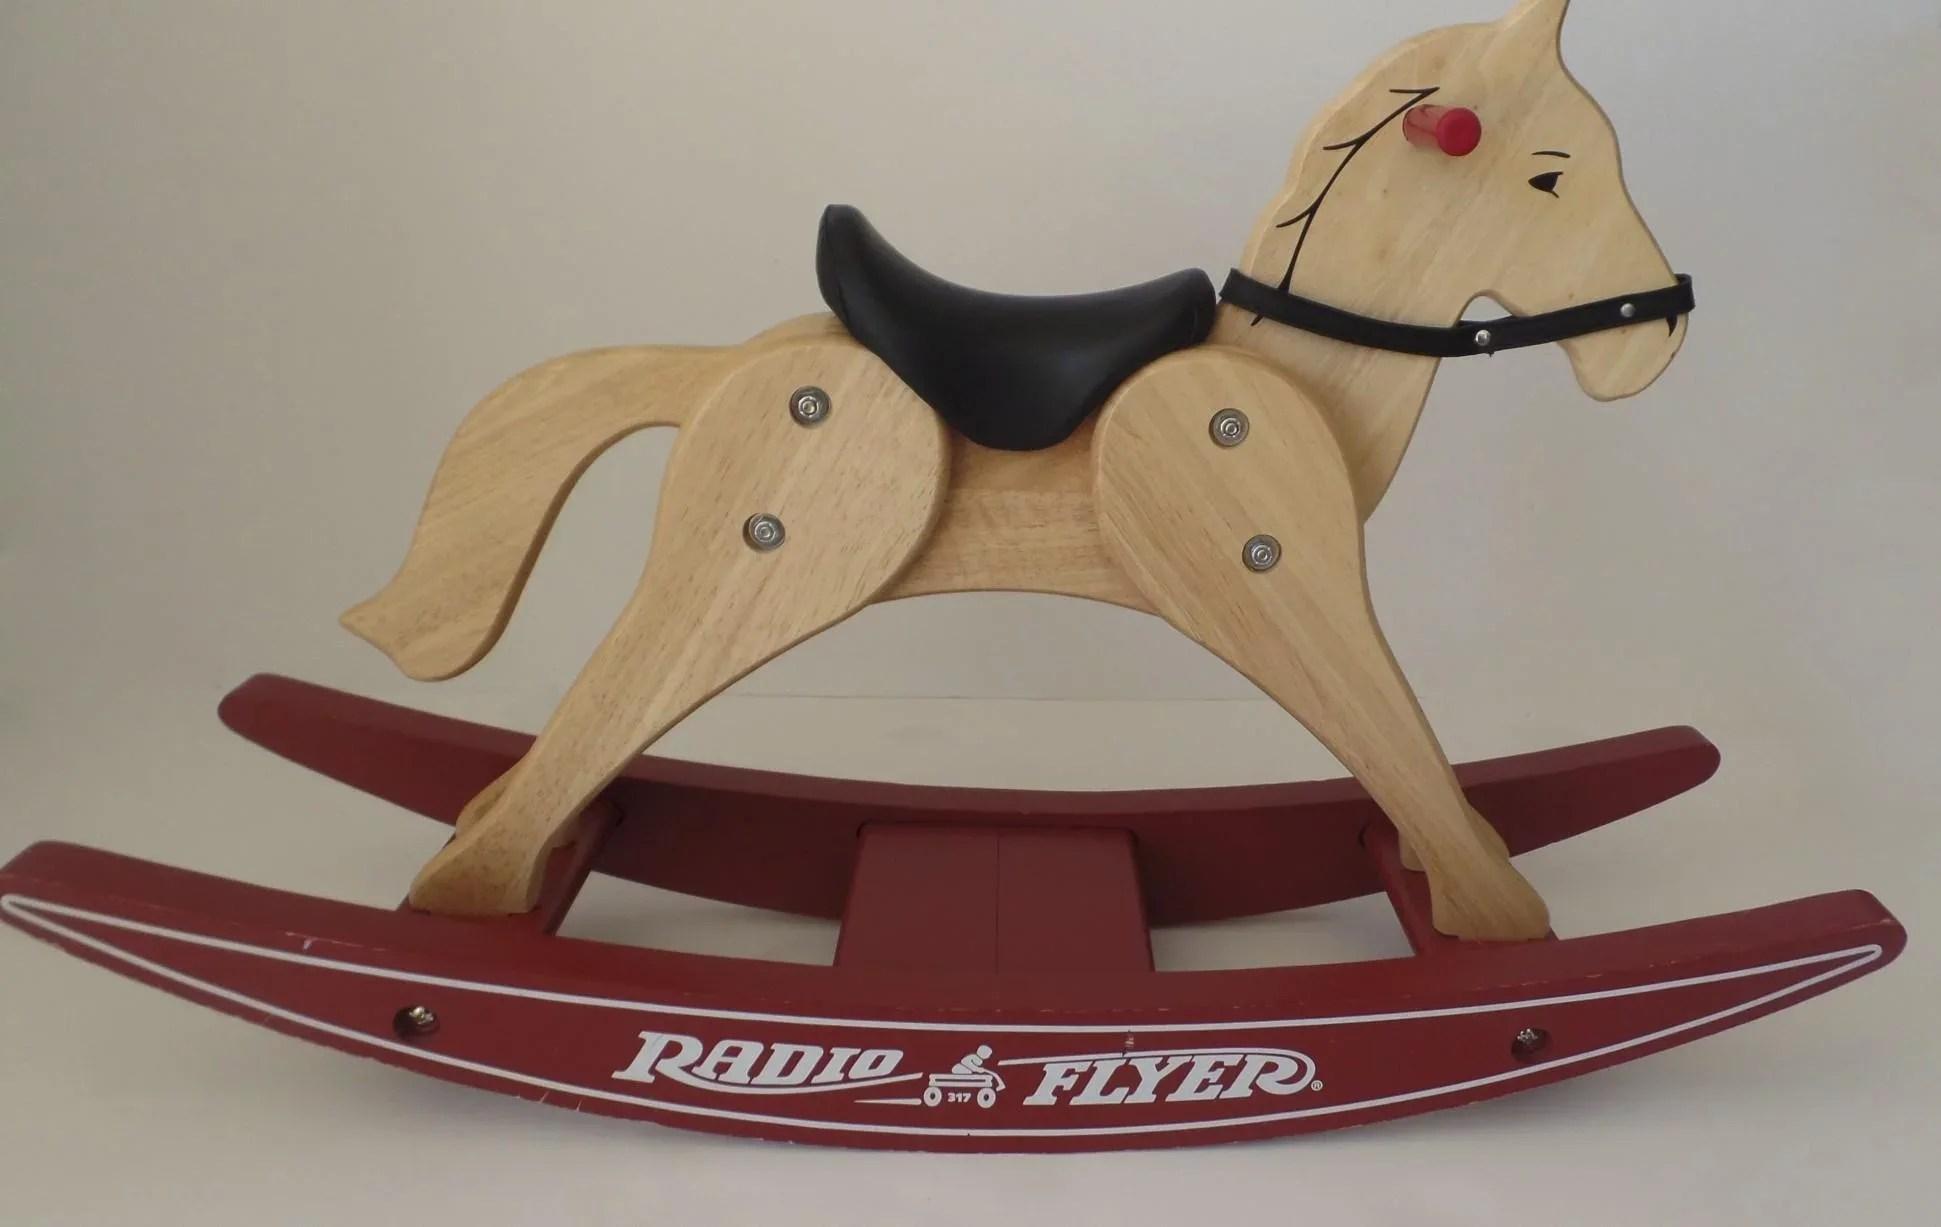 Vintage Wooden Rocking Horse Radio Flyer 371 LL Bean